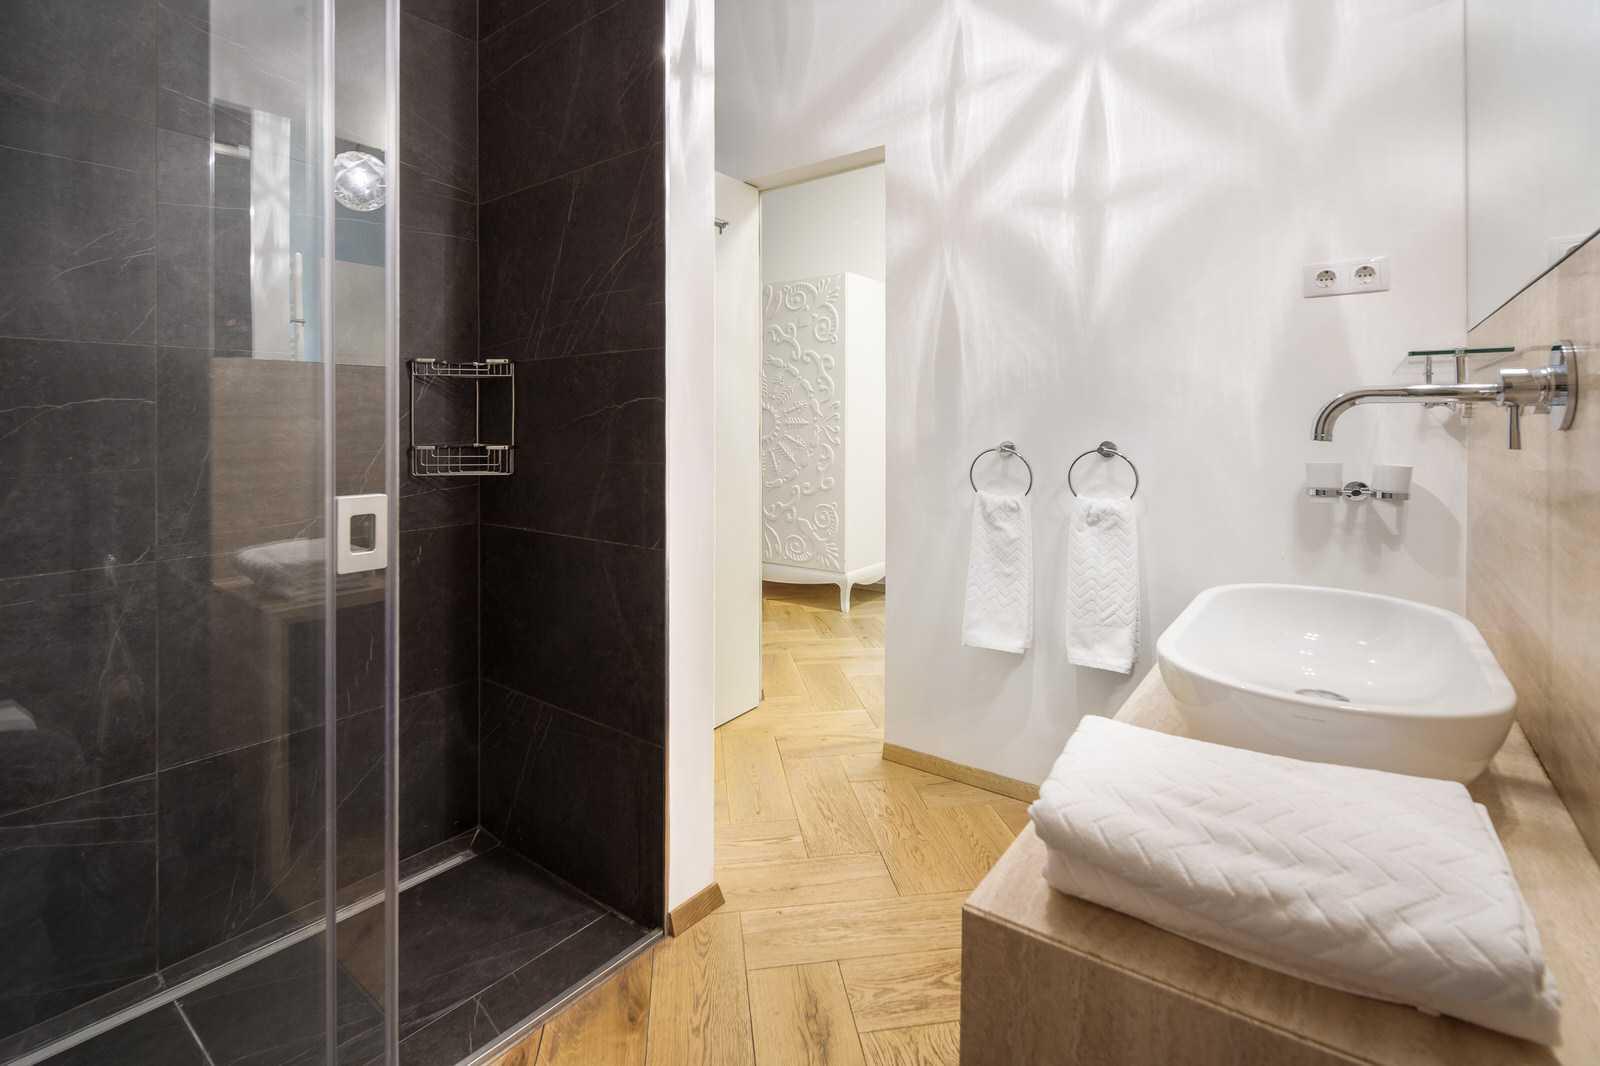 Ljubljana 2-bedroom Beethovnova apartment's master bedroom en-suite bathroom